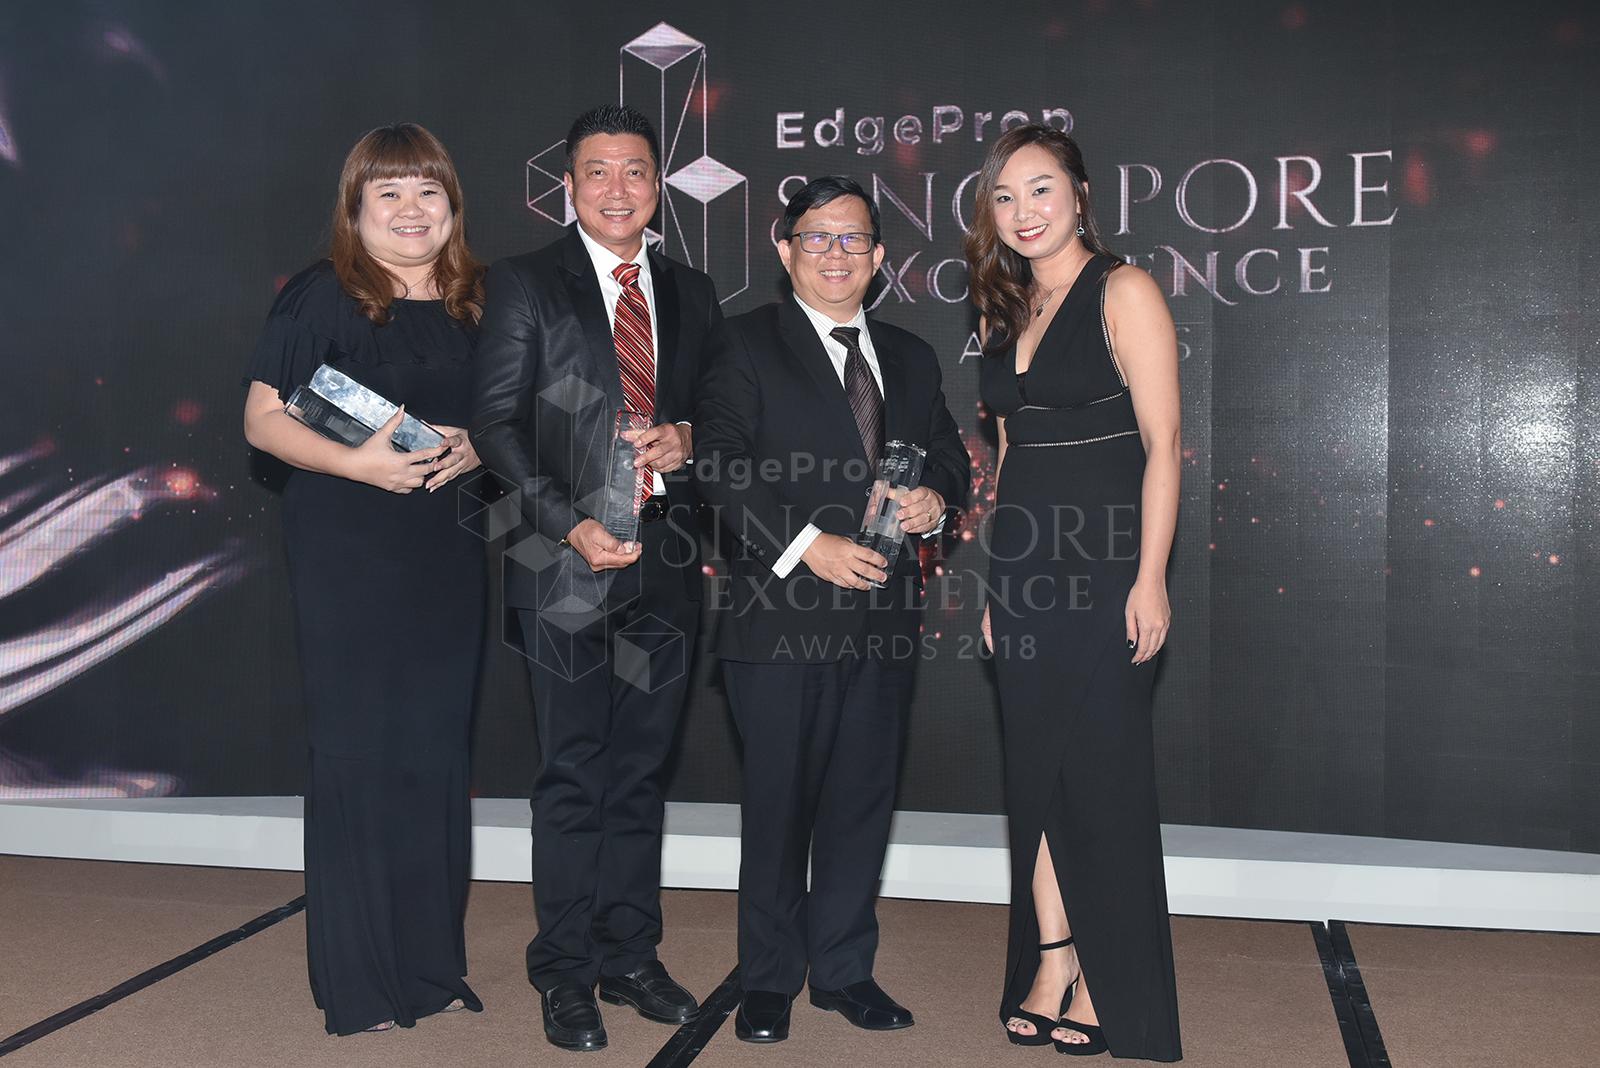 LEI_EDGEPROP_EXCELLENCE_AWARDS_2018_WINNERS_26_AC.jpg